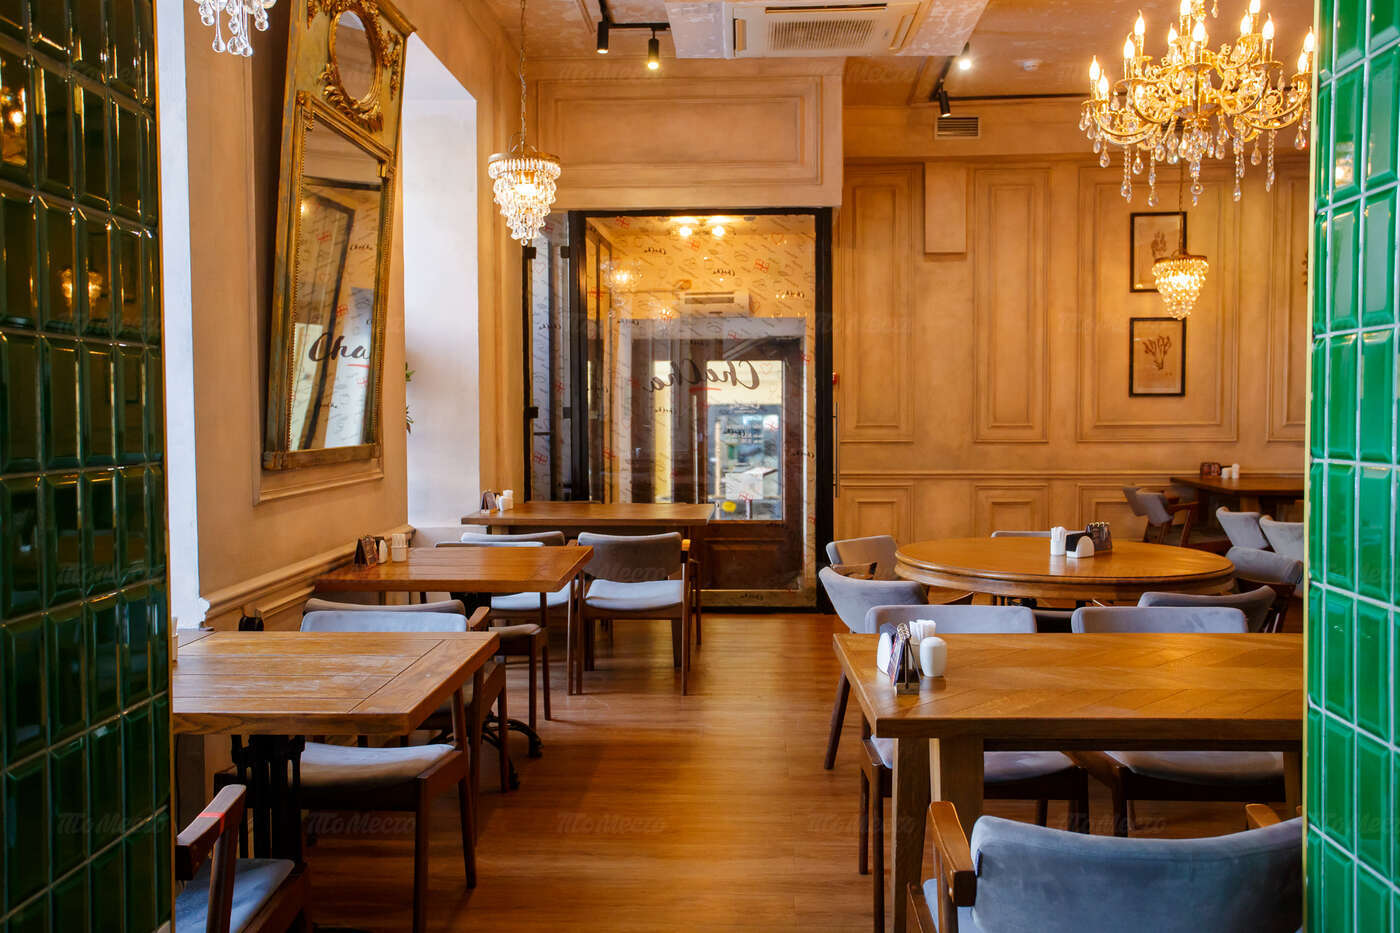 Ресторан Чача на набережной канала Грибоедова фото 14